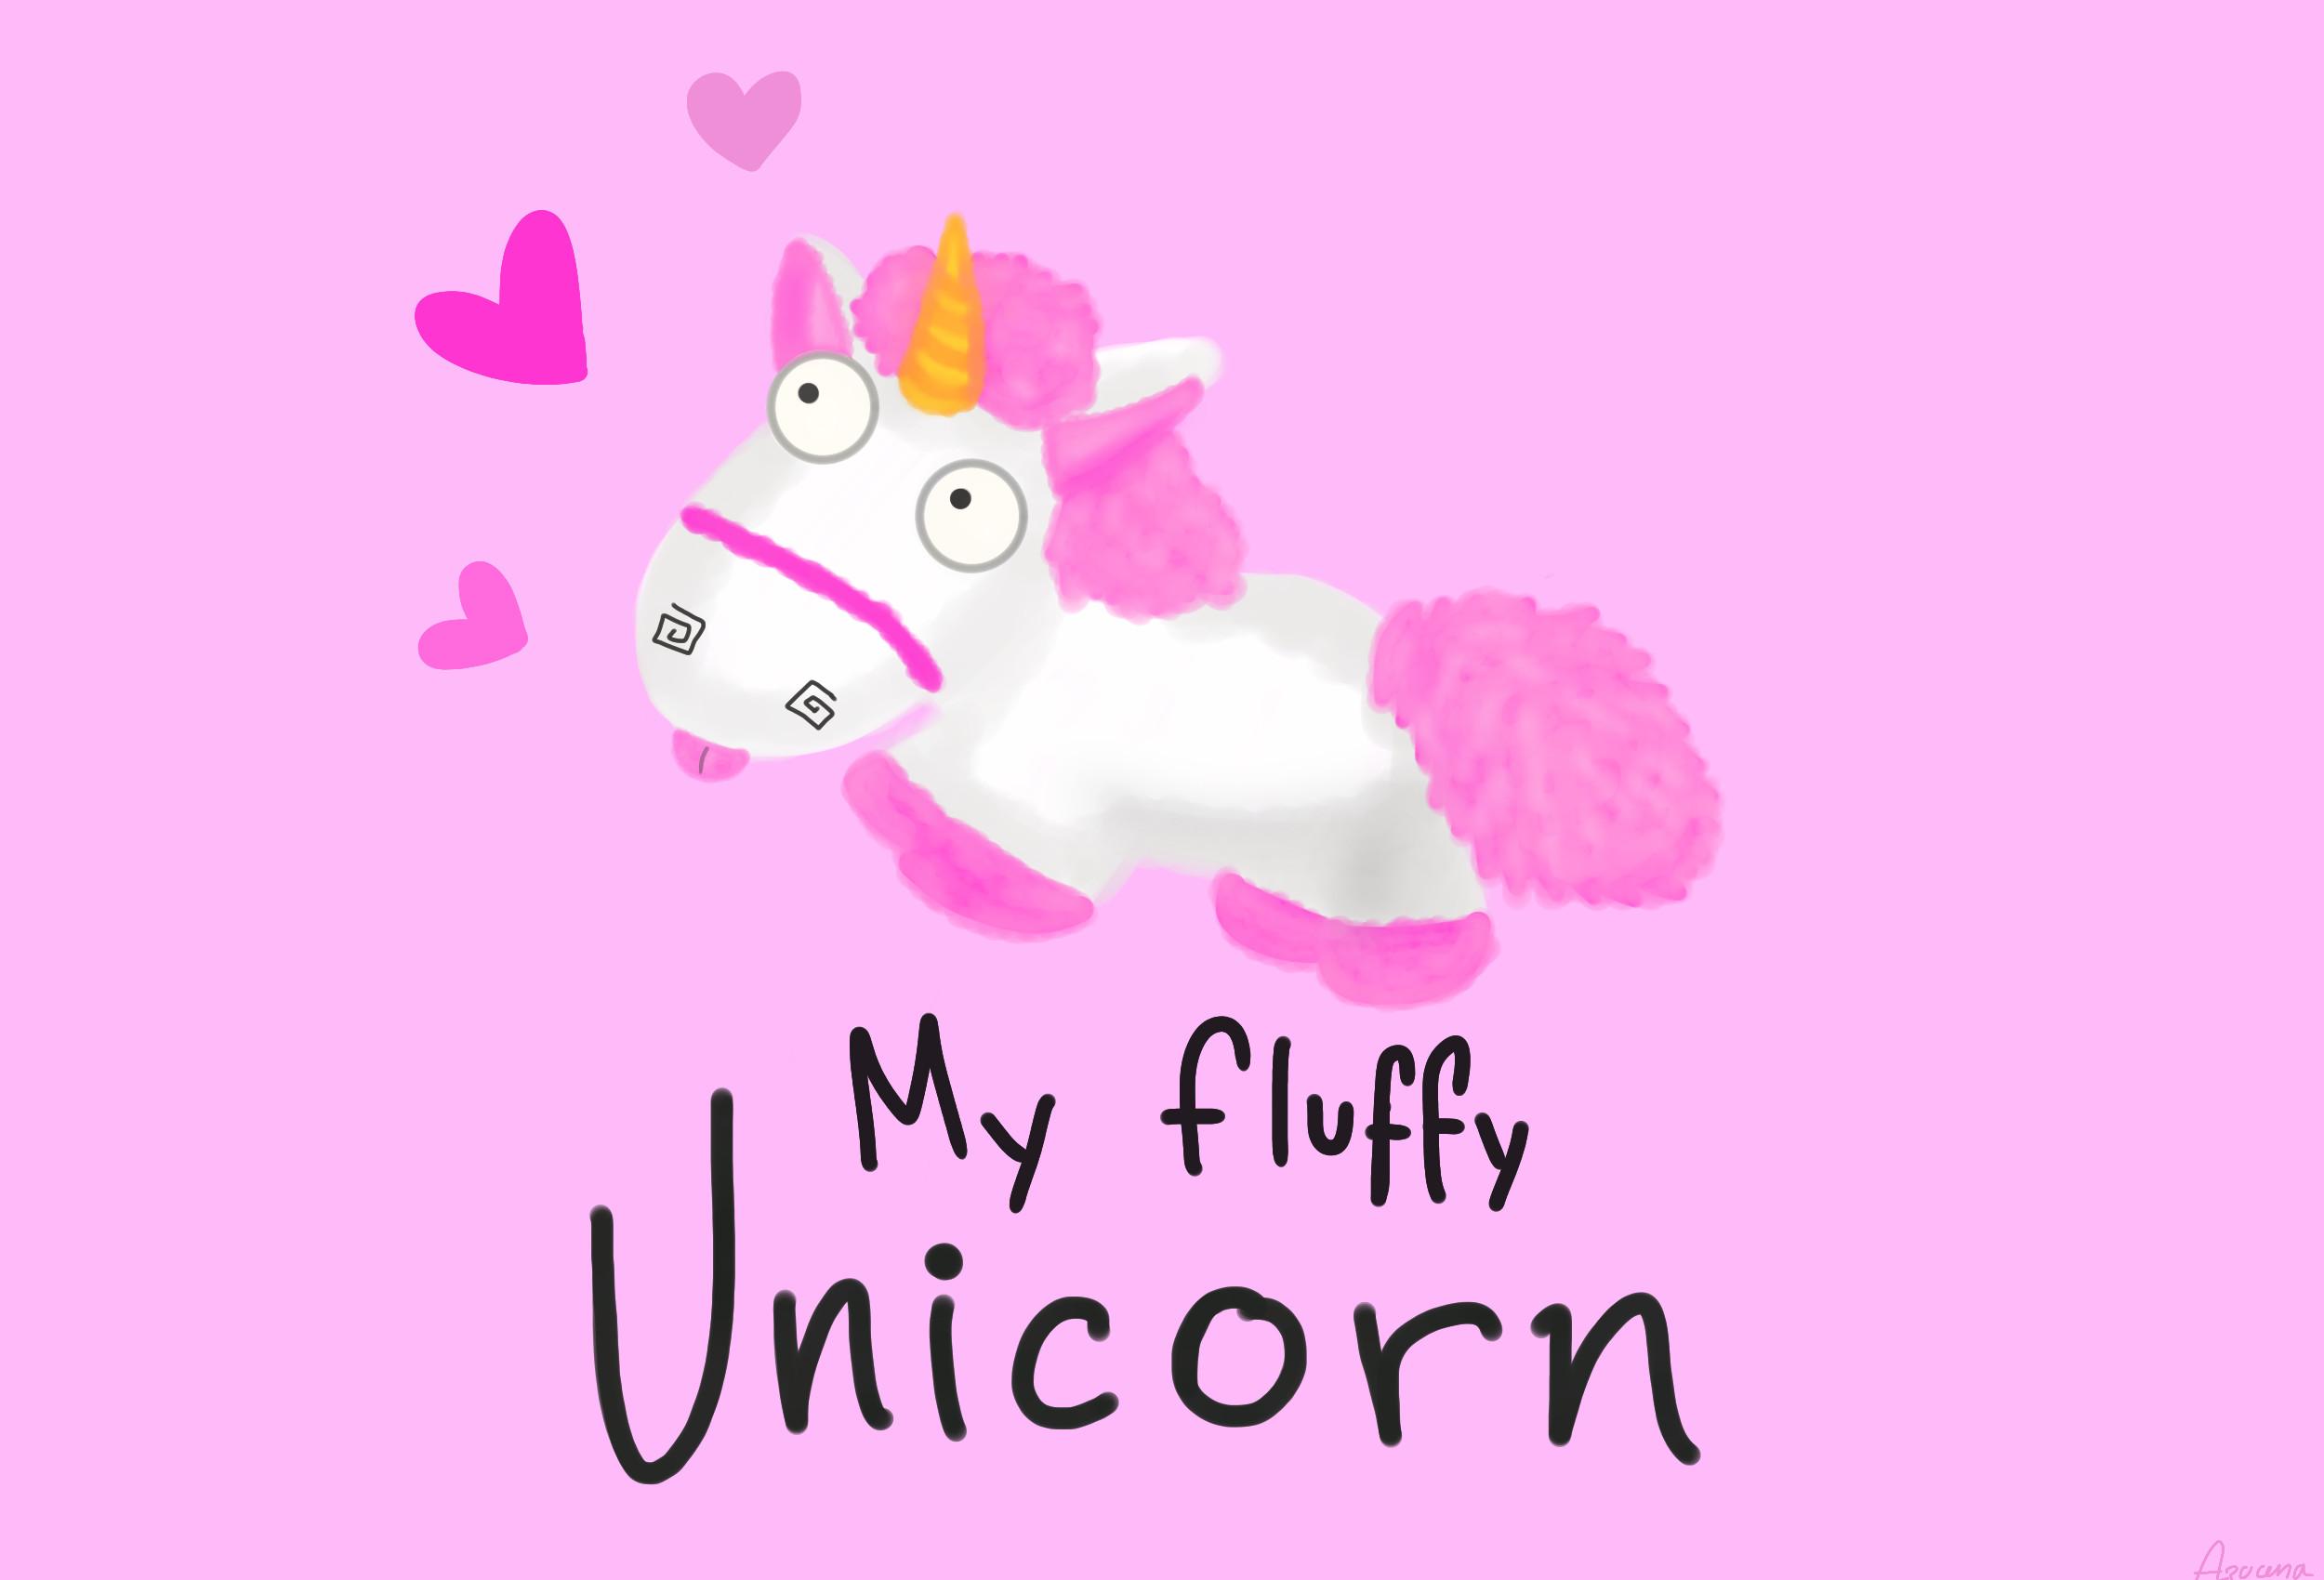 Cartoon Wallpaper Iphone X Pink Fluffy Unicorns Wallpapers 183 ①